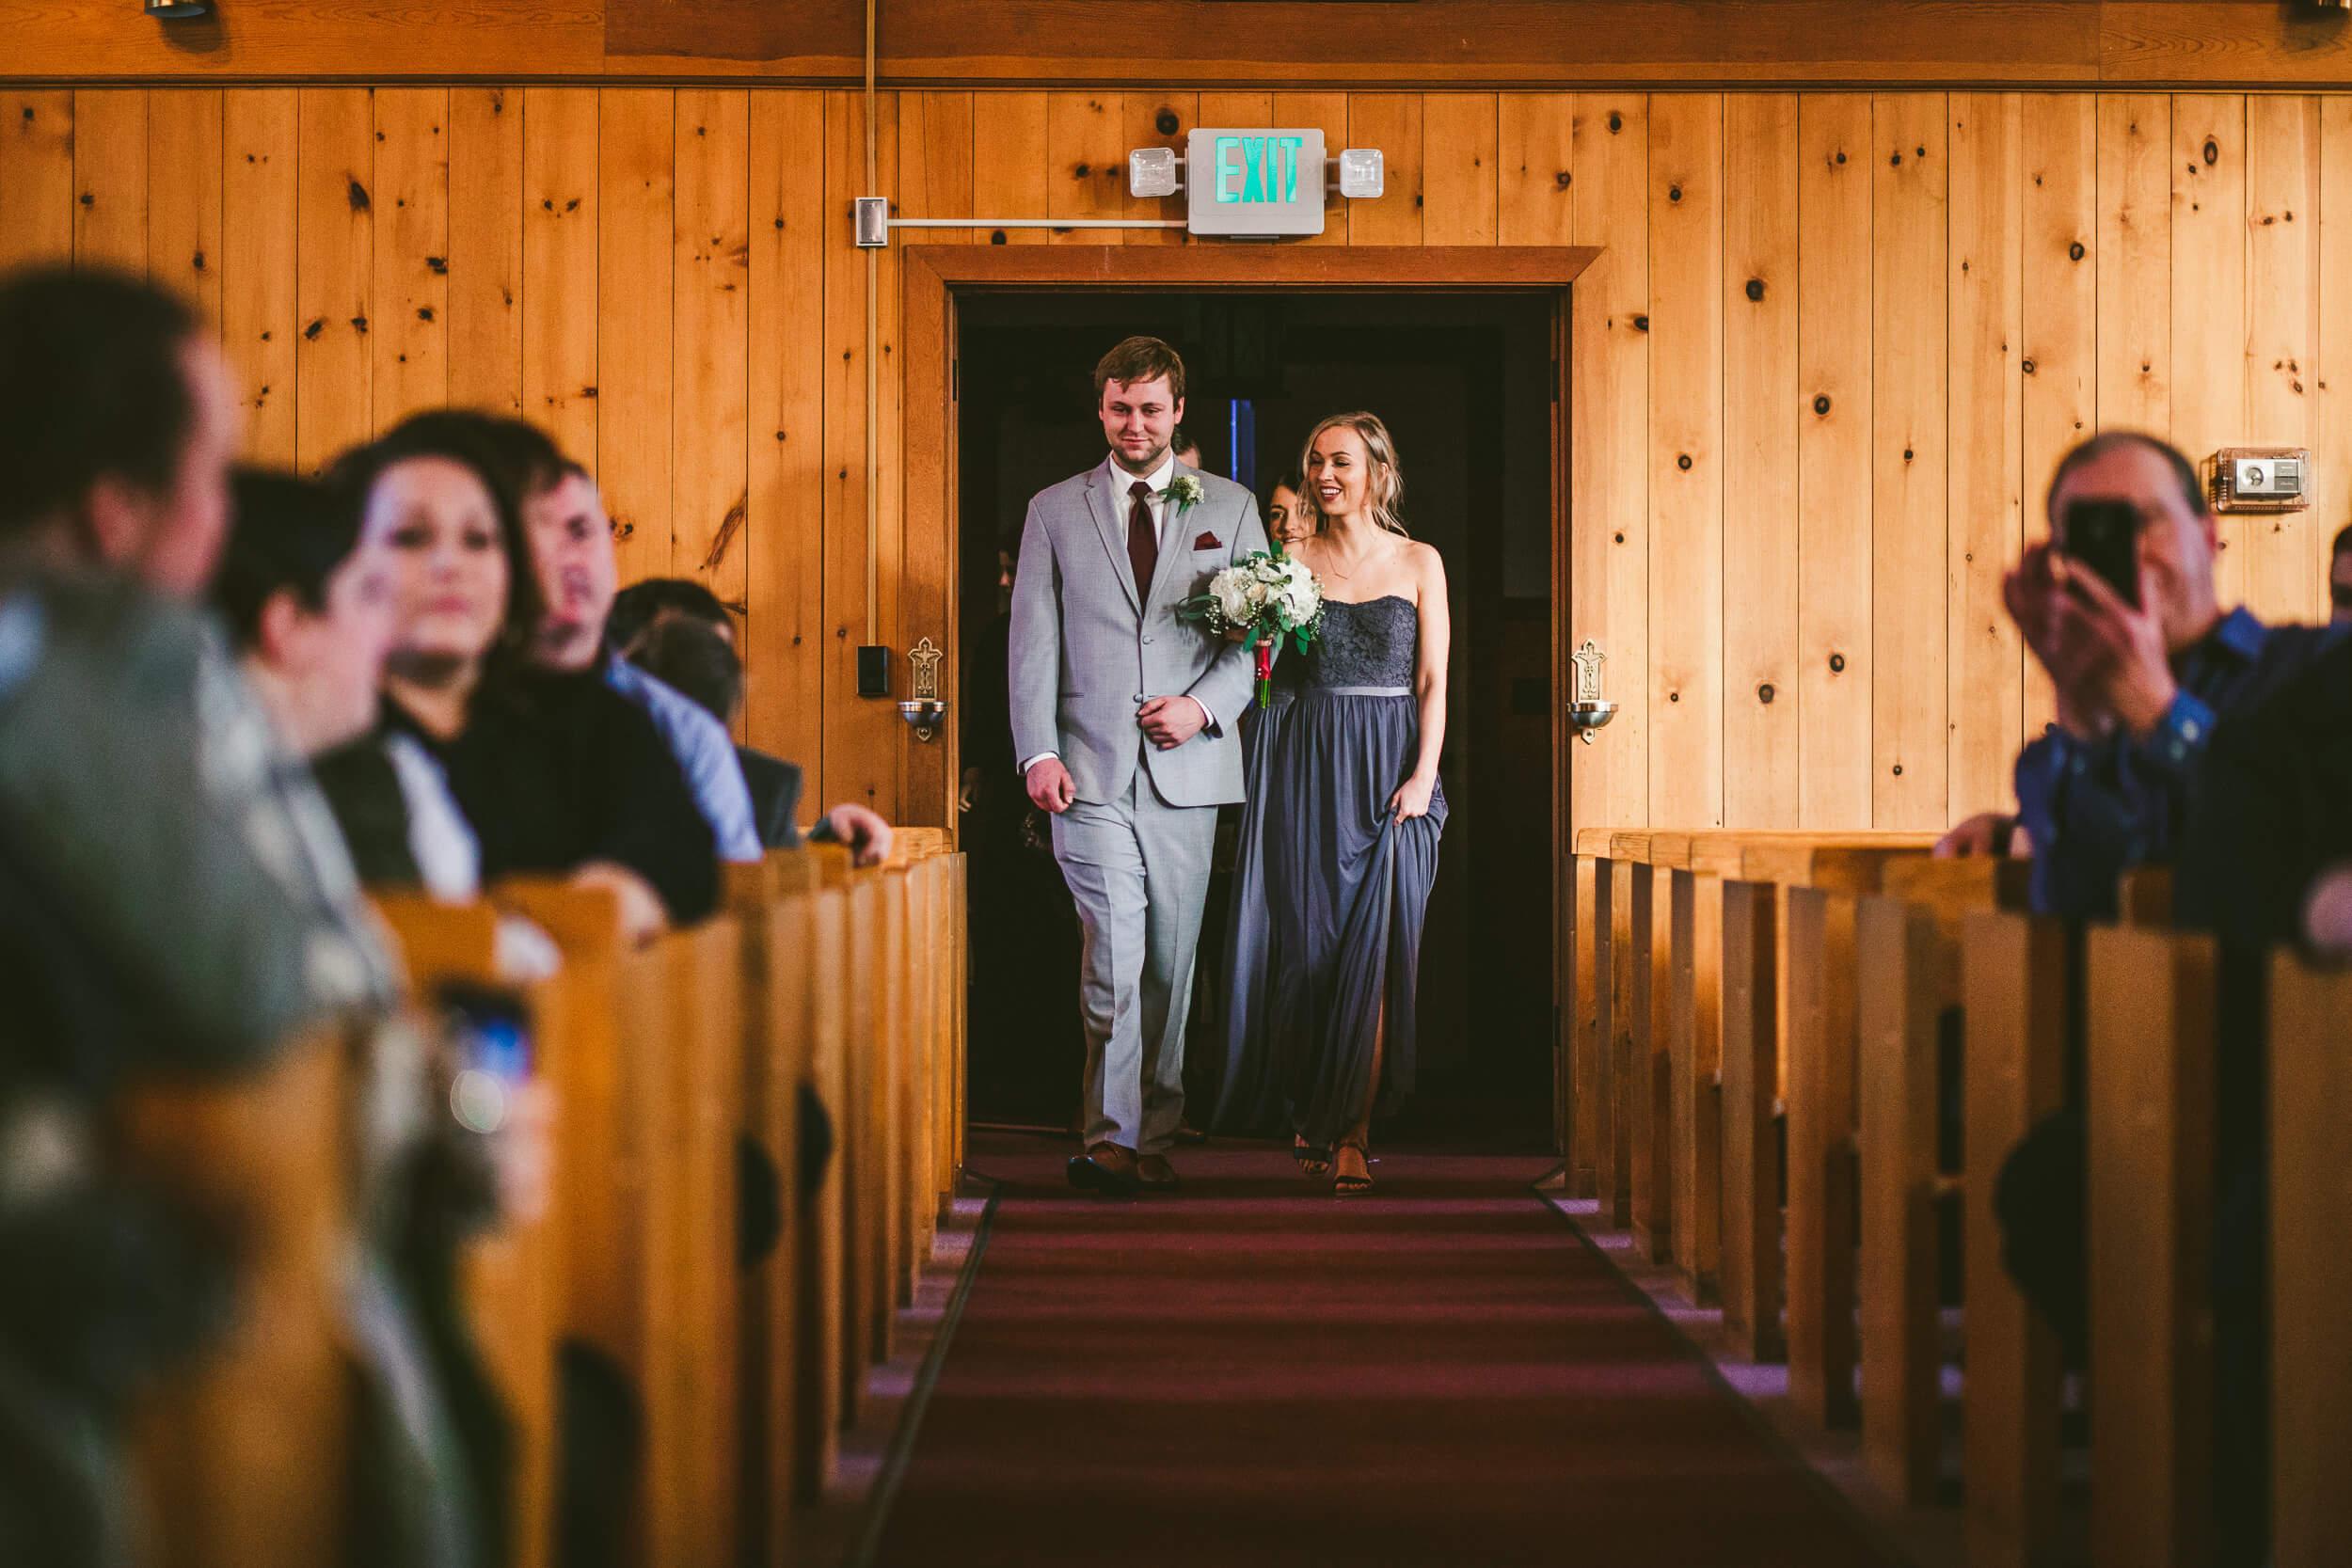 mukogawa winter wedding in spokane (140).jpg